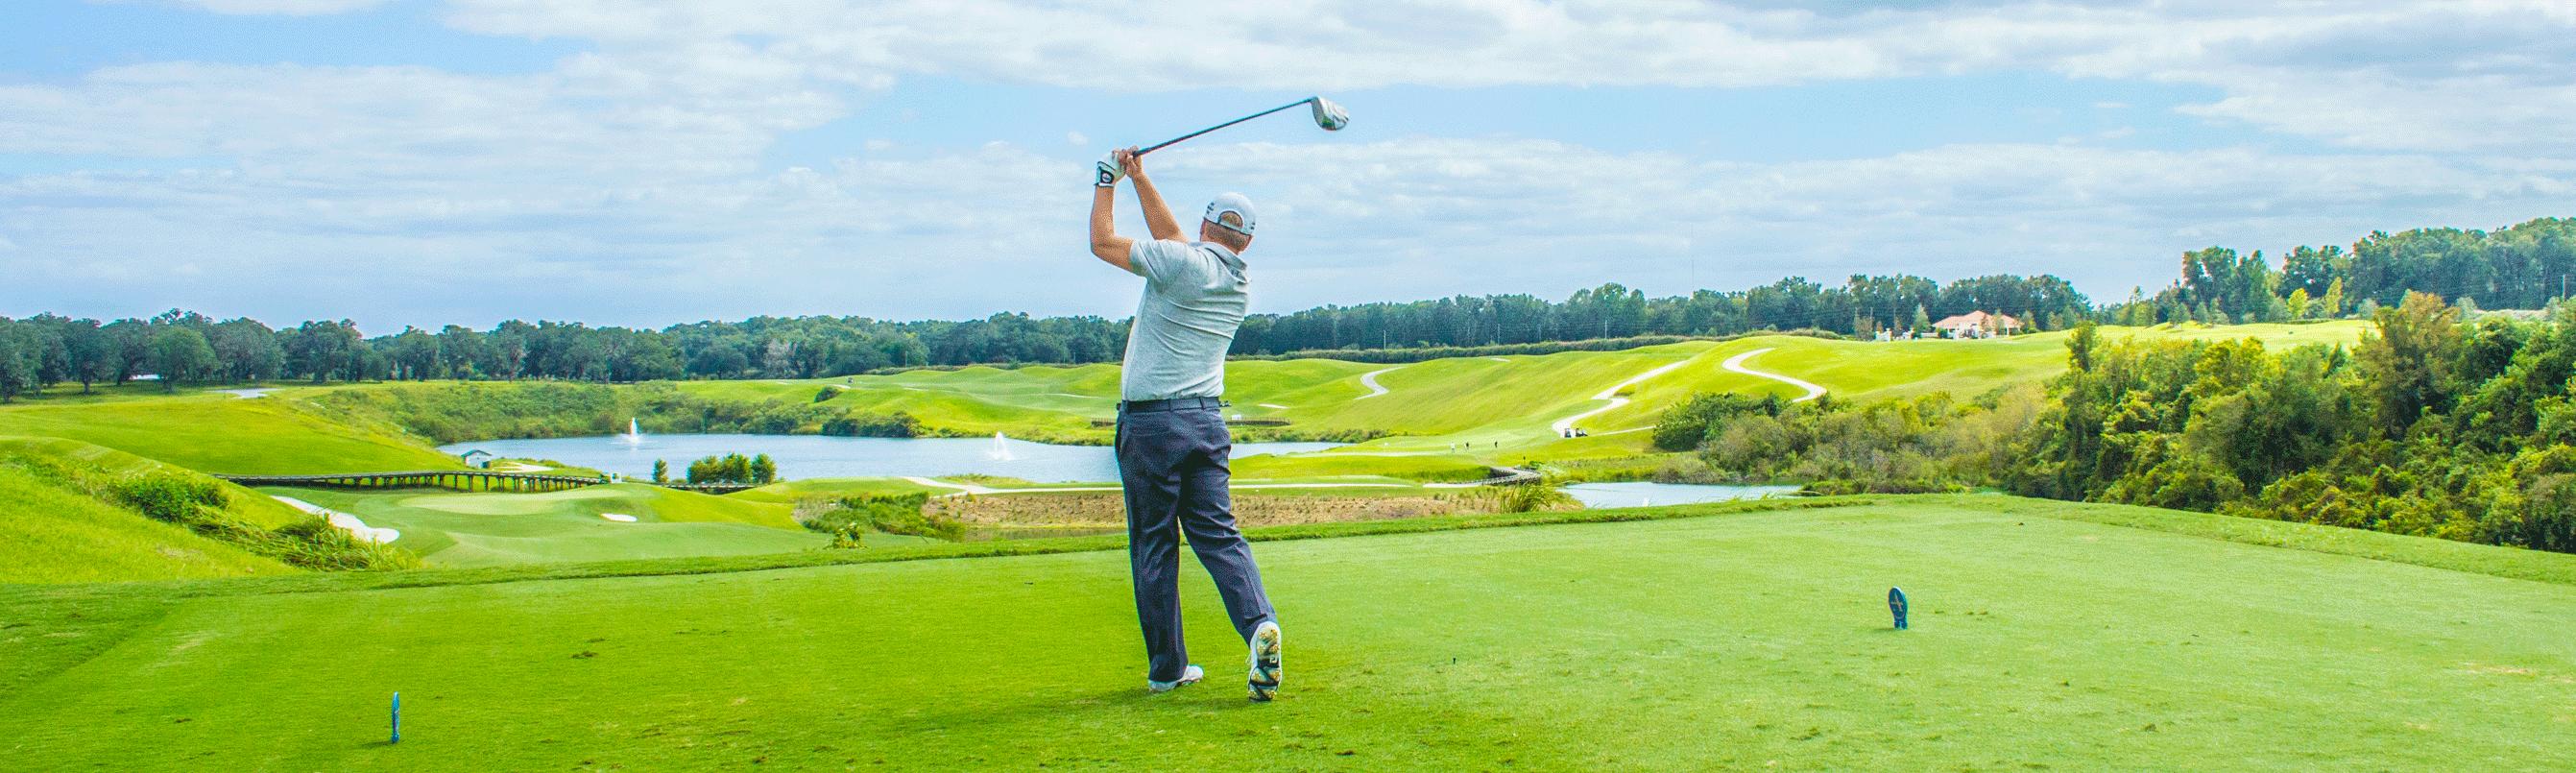 A man hitting a golf ball